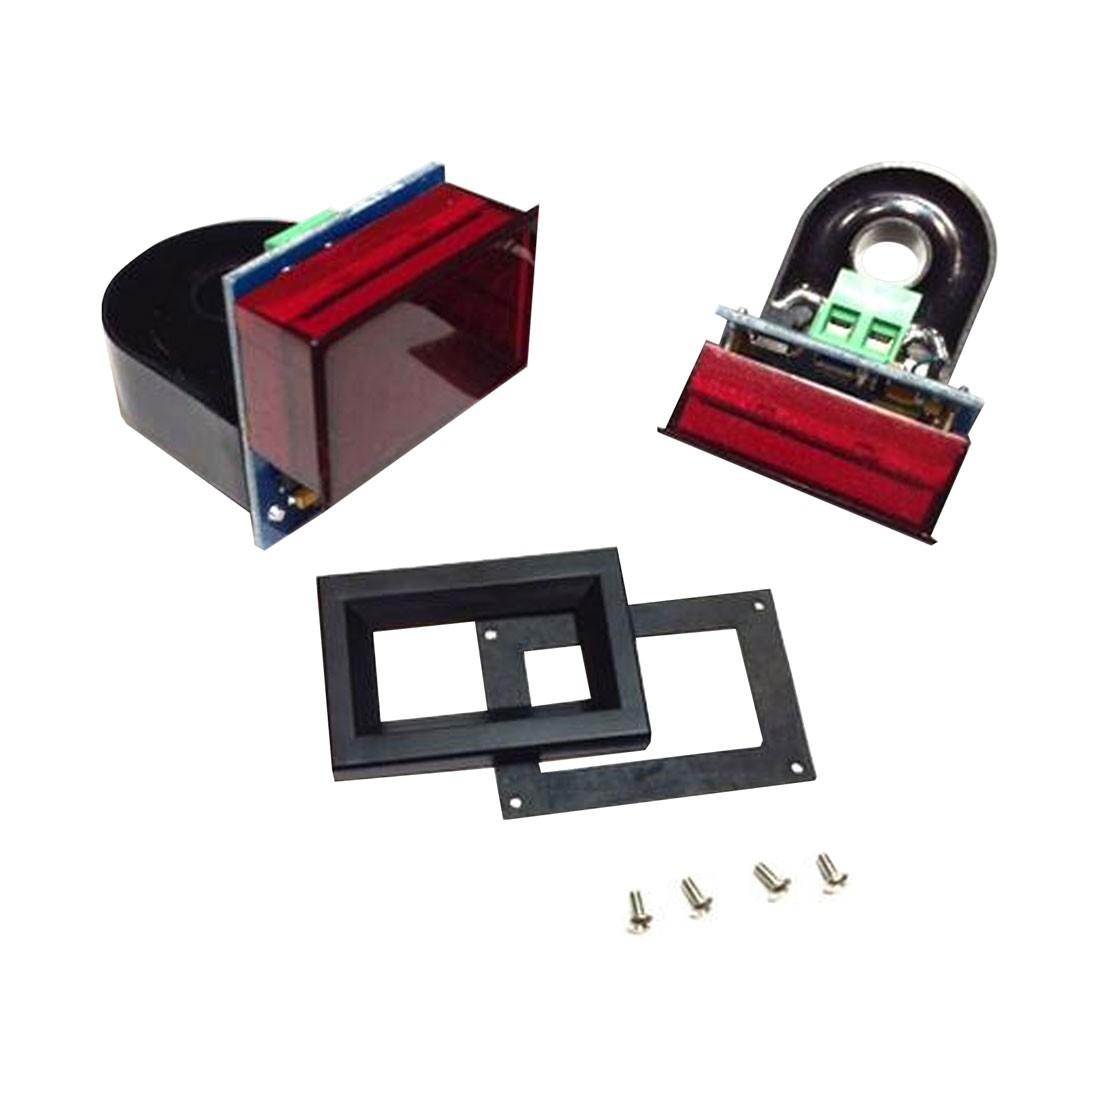 DLA20-ACA Series LED Digital Panel Meter